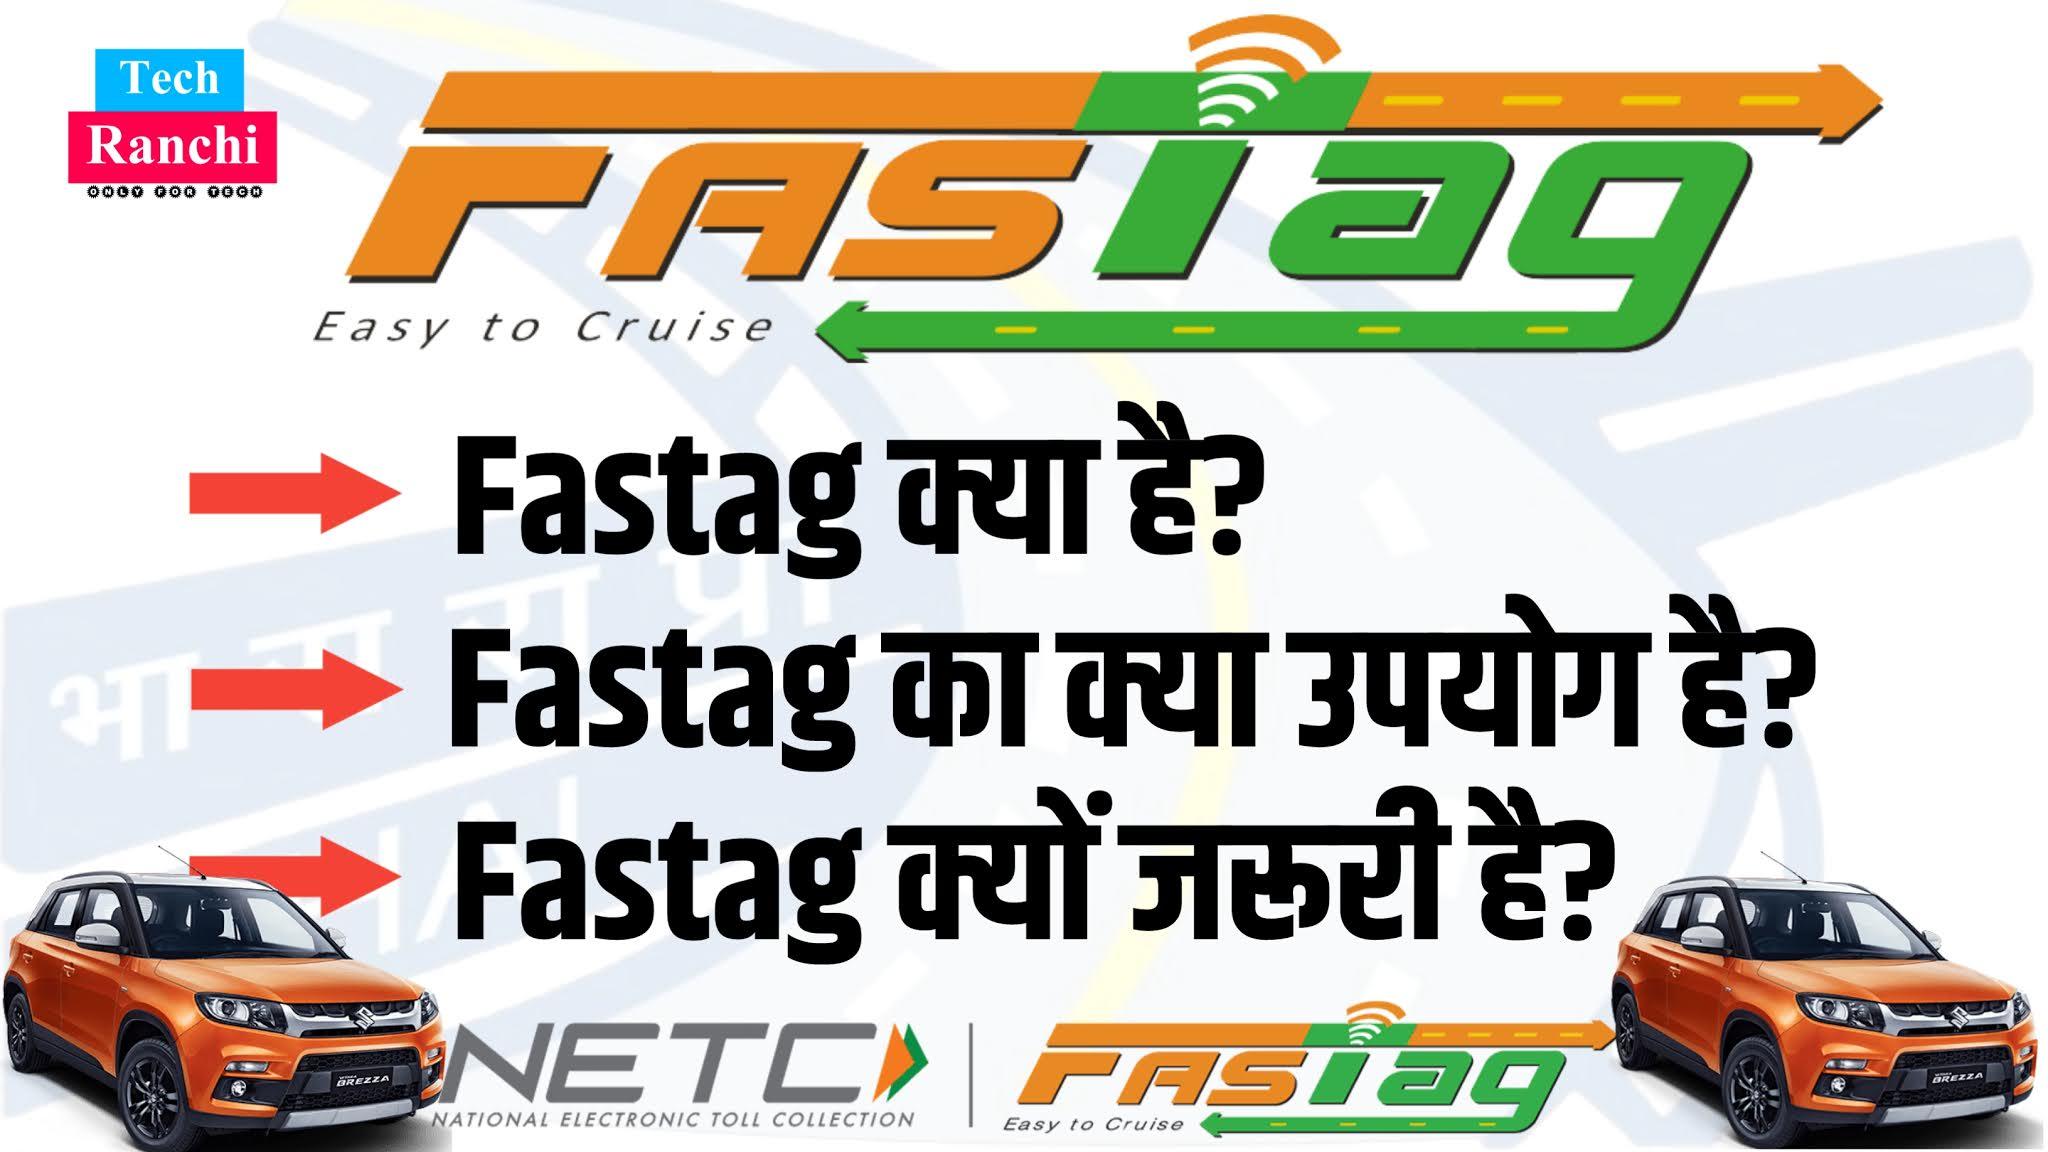 FASTag Kya Hai, FASTag Ke Kya Fayde Hain, What is FASTag, FASTag